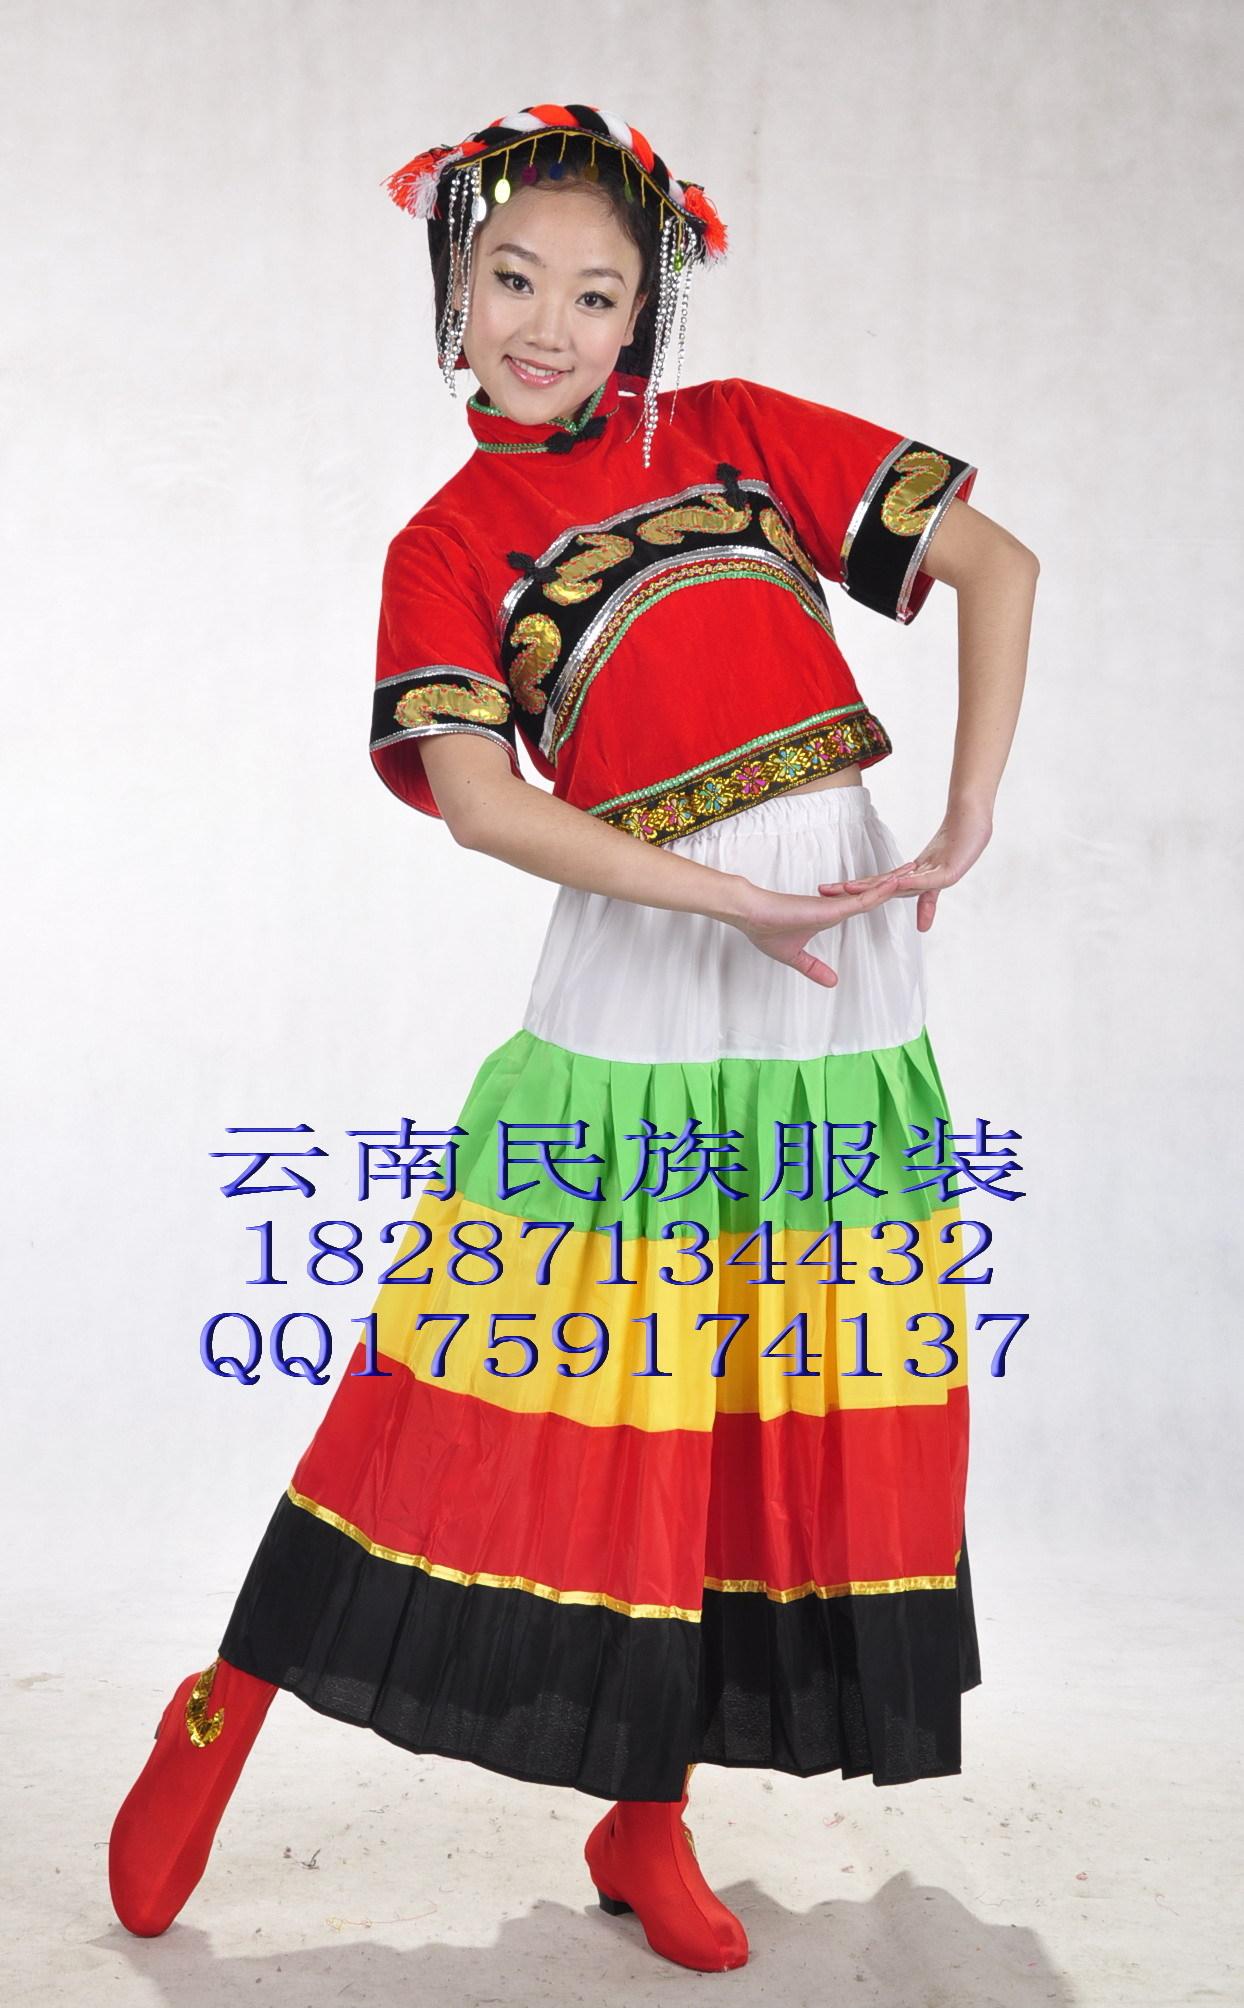 Национальный костюм Yi costumes yi laiwei ylw14bx166